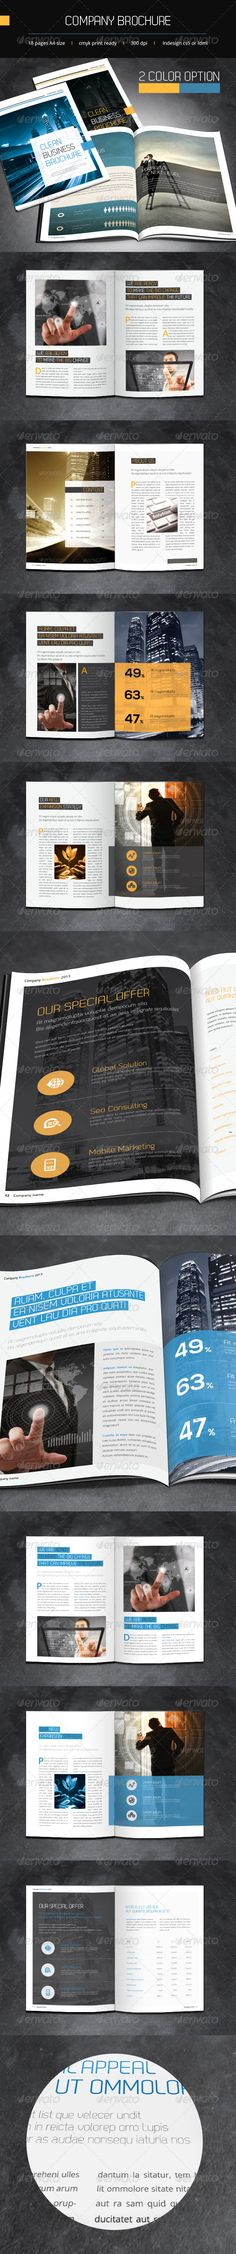 34 best brochure designs images on Pinterest Brochure design - property brochure